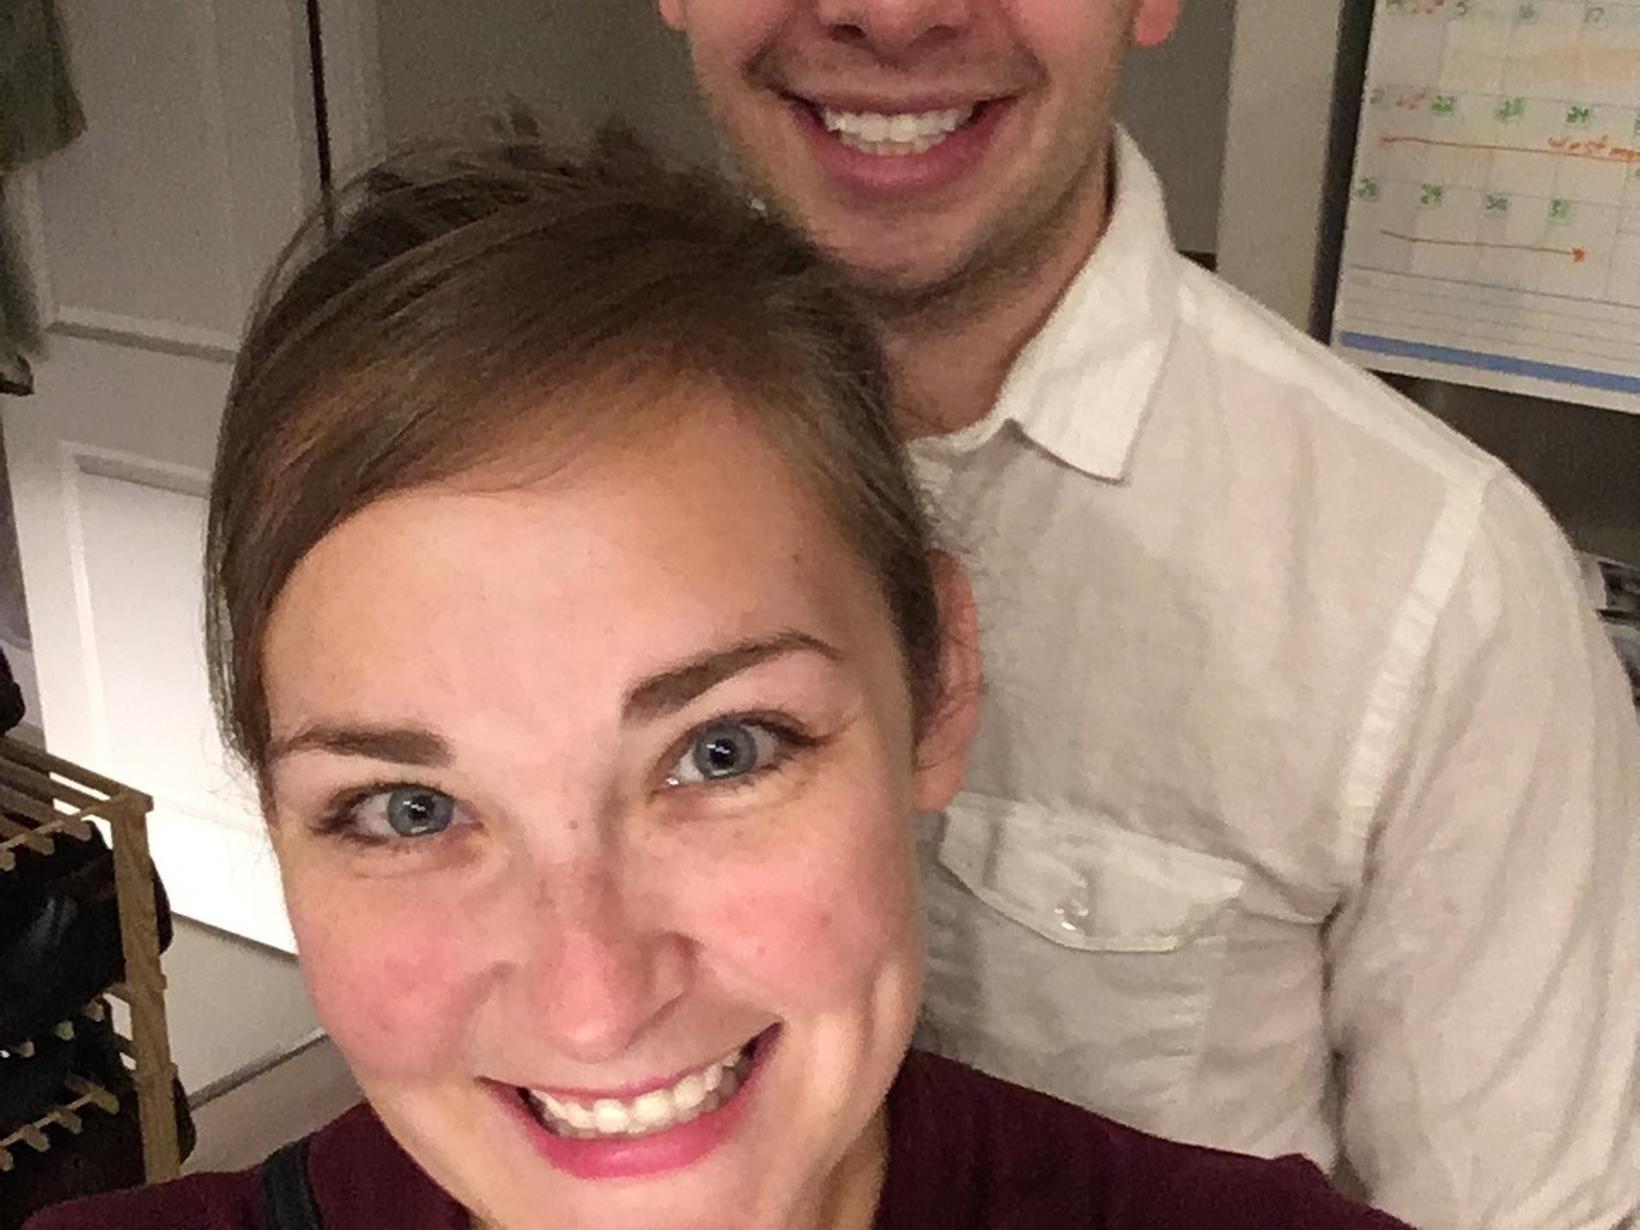 Kayla-renee & Andrew from Toronto, Ontario, Canada